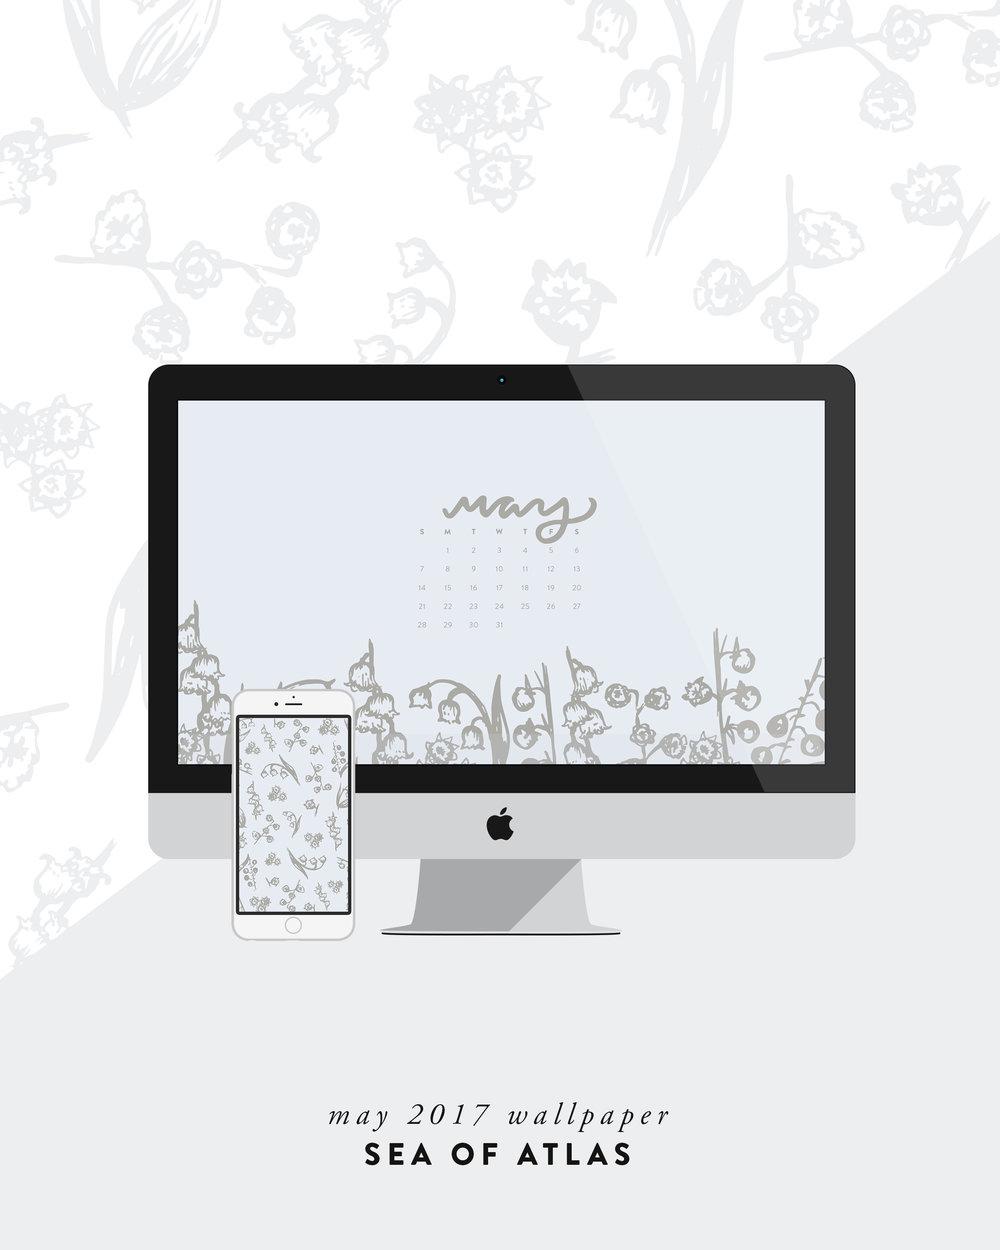 Desktop Wallpaper: May 2017 Calendar | Sea of Atlas